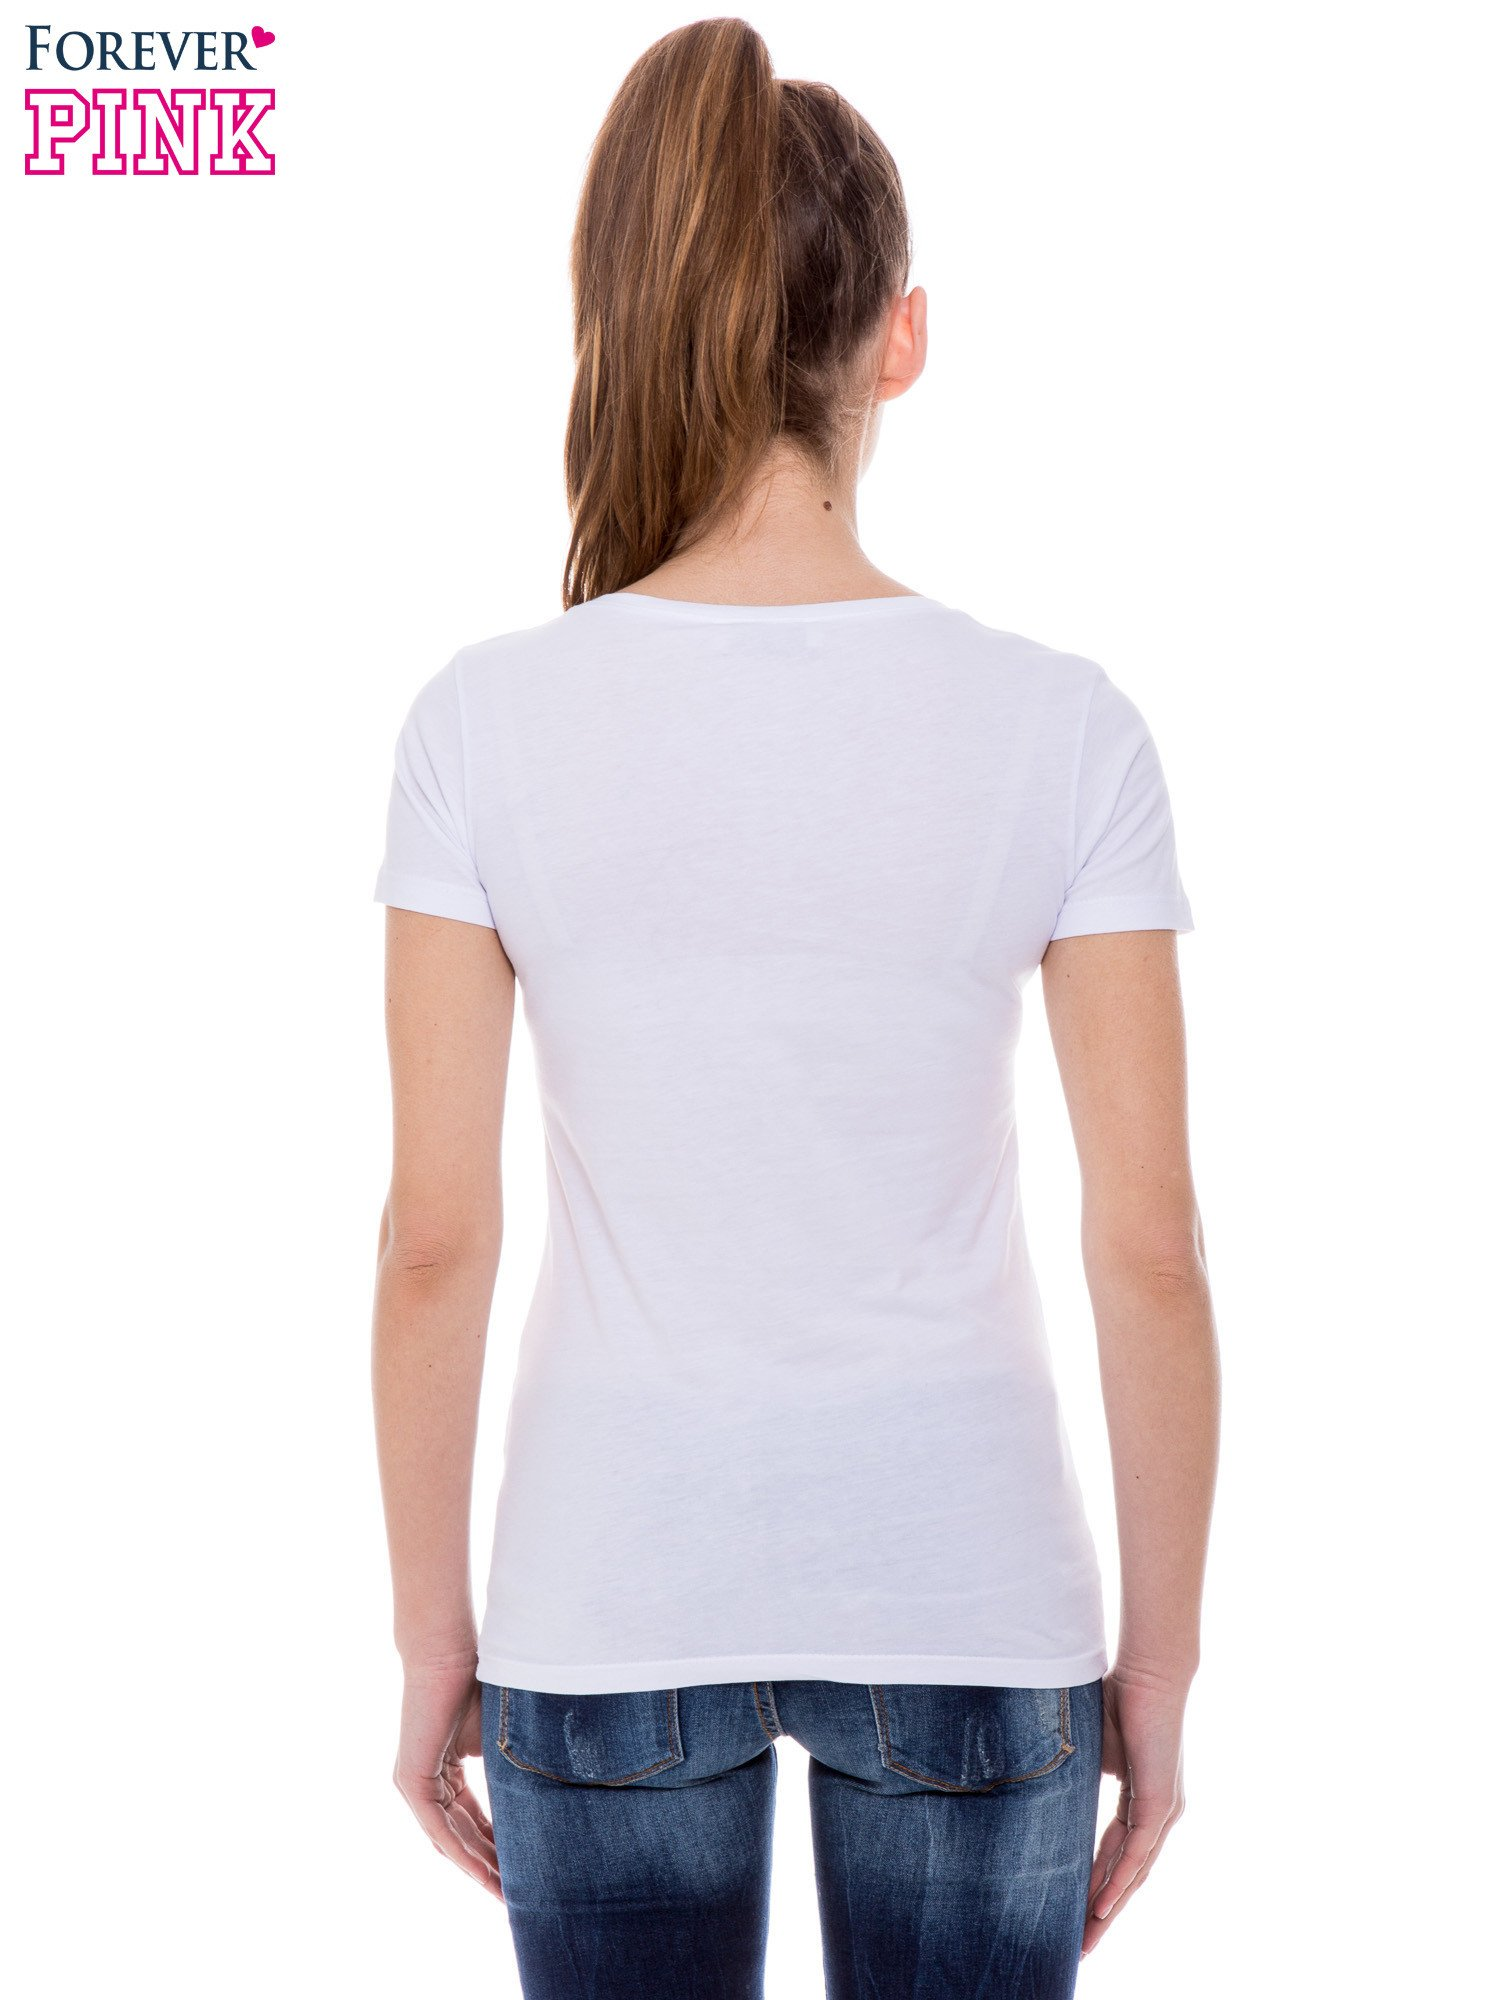 Biały t-shirt z nadrukiem ust KISS                                  zdj.                                  4